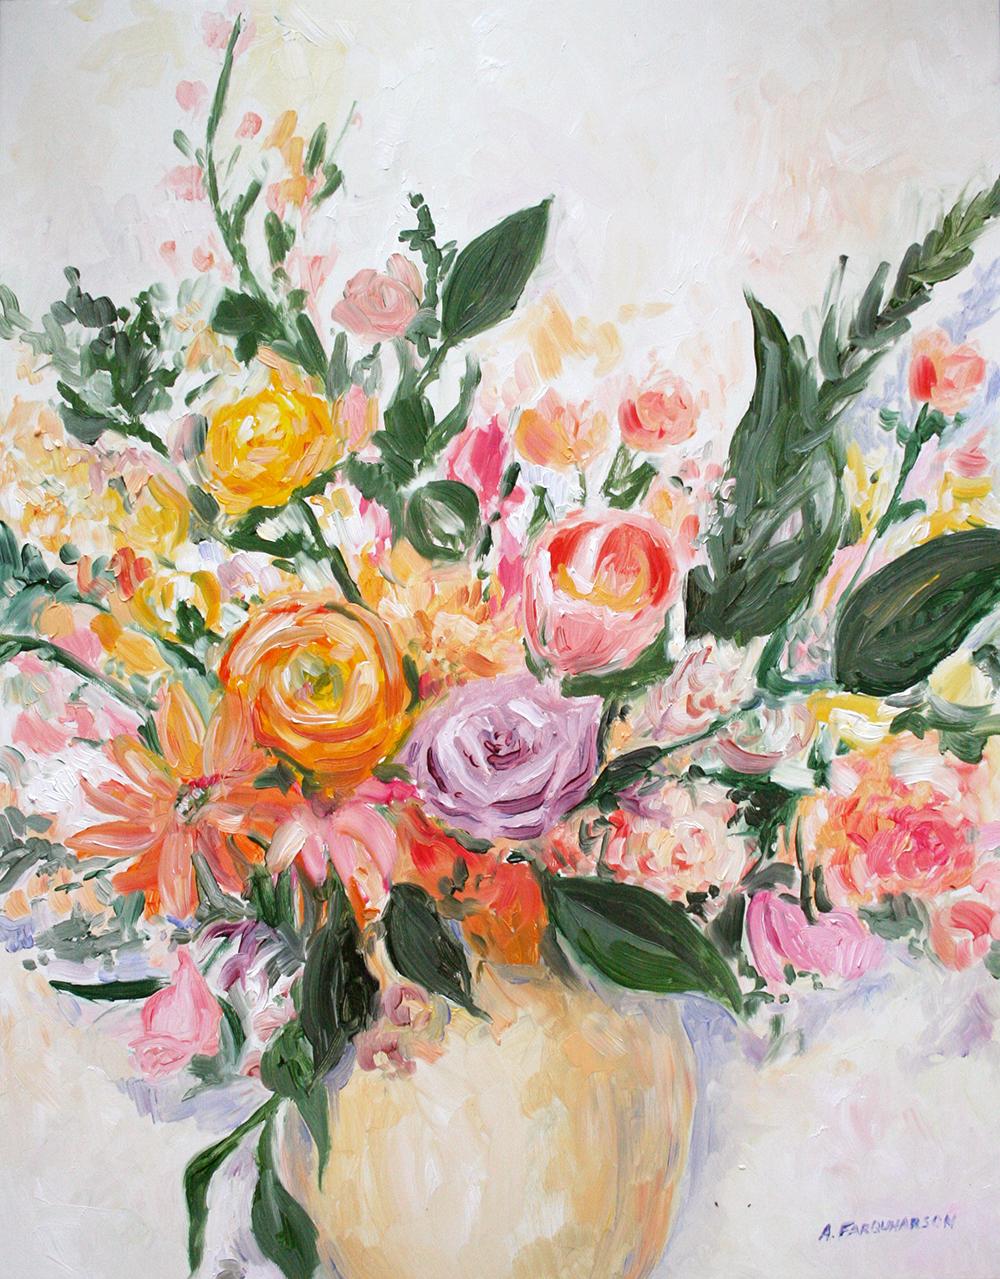 Warm Floral Bouquet. 11 x 14. Oil on Panel.